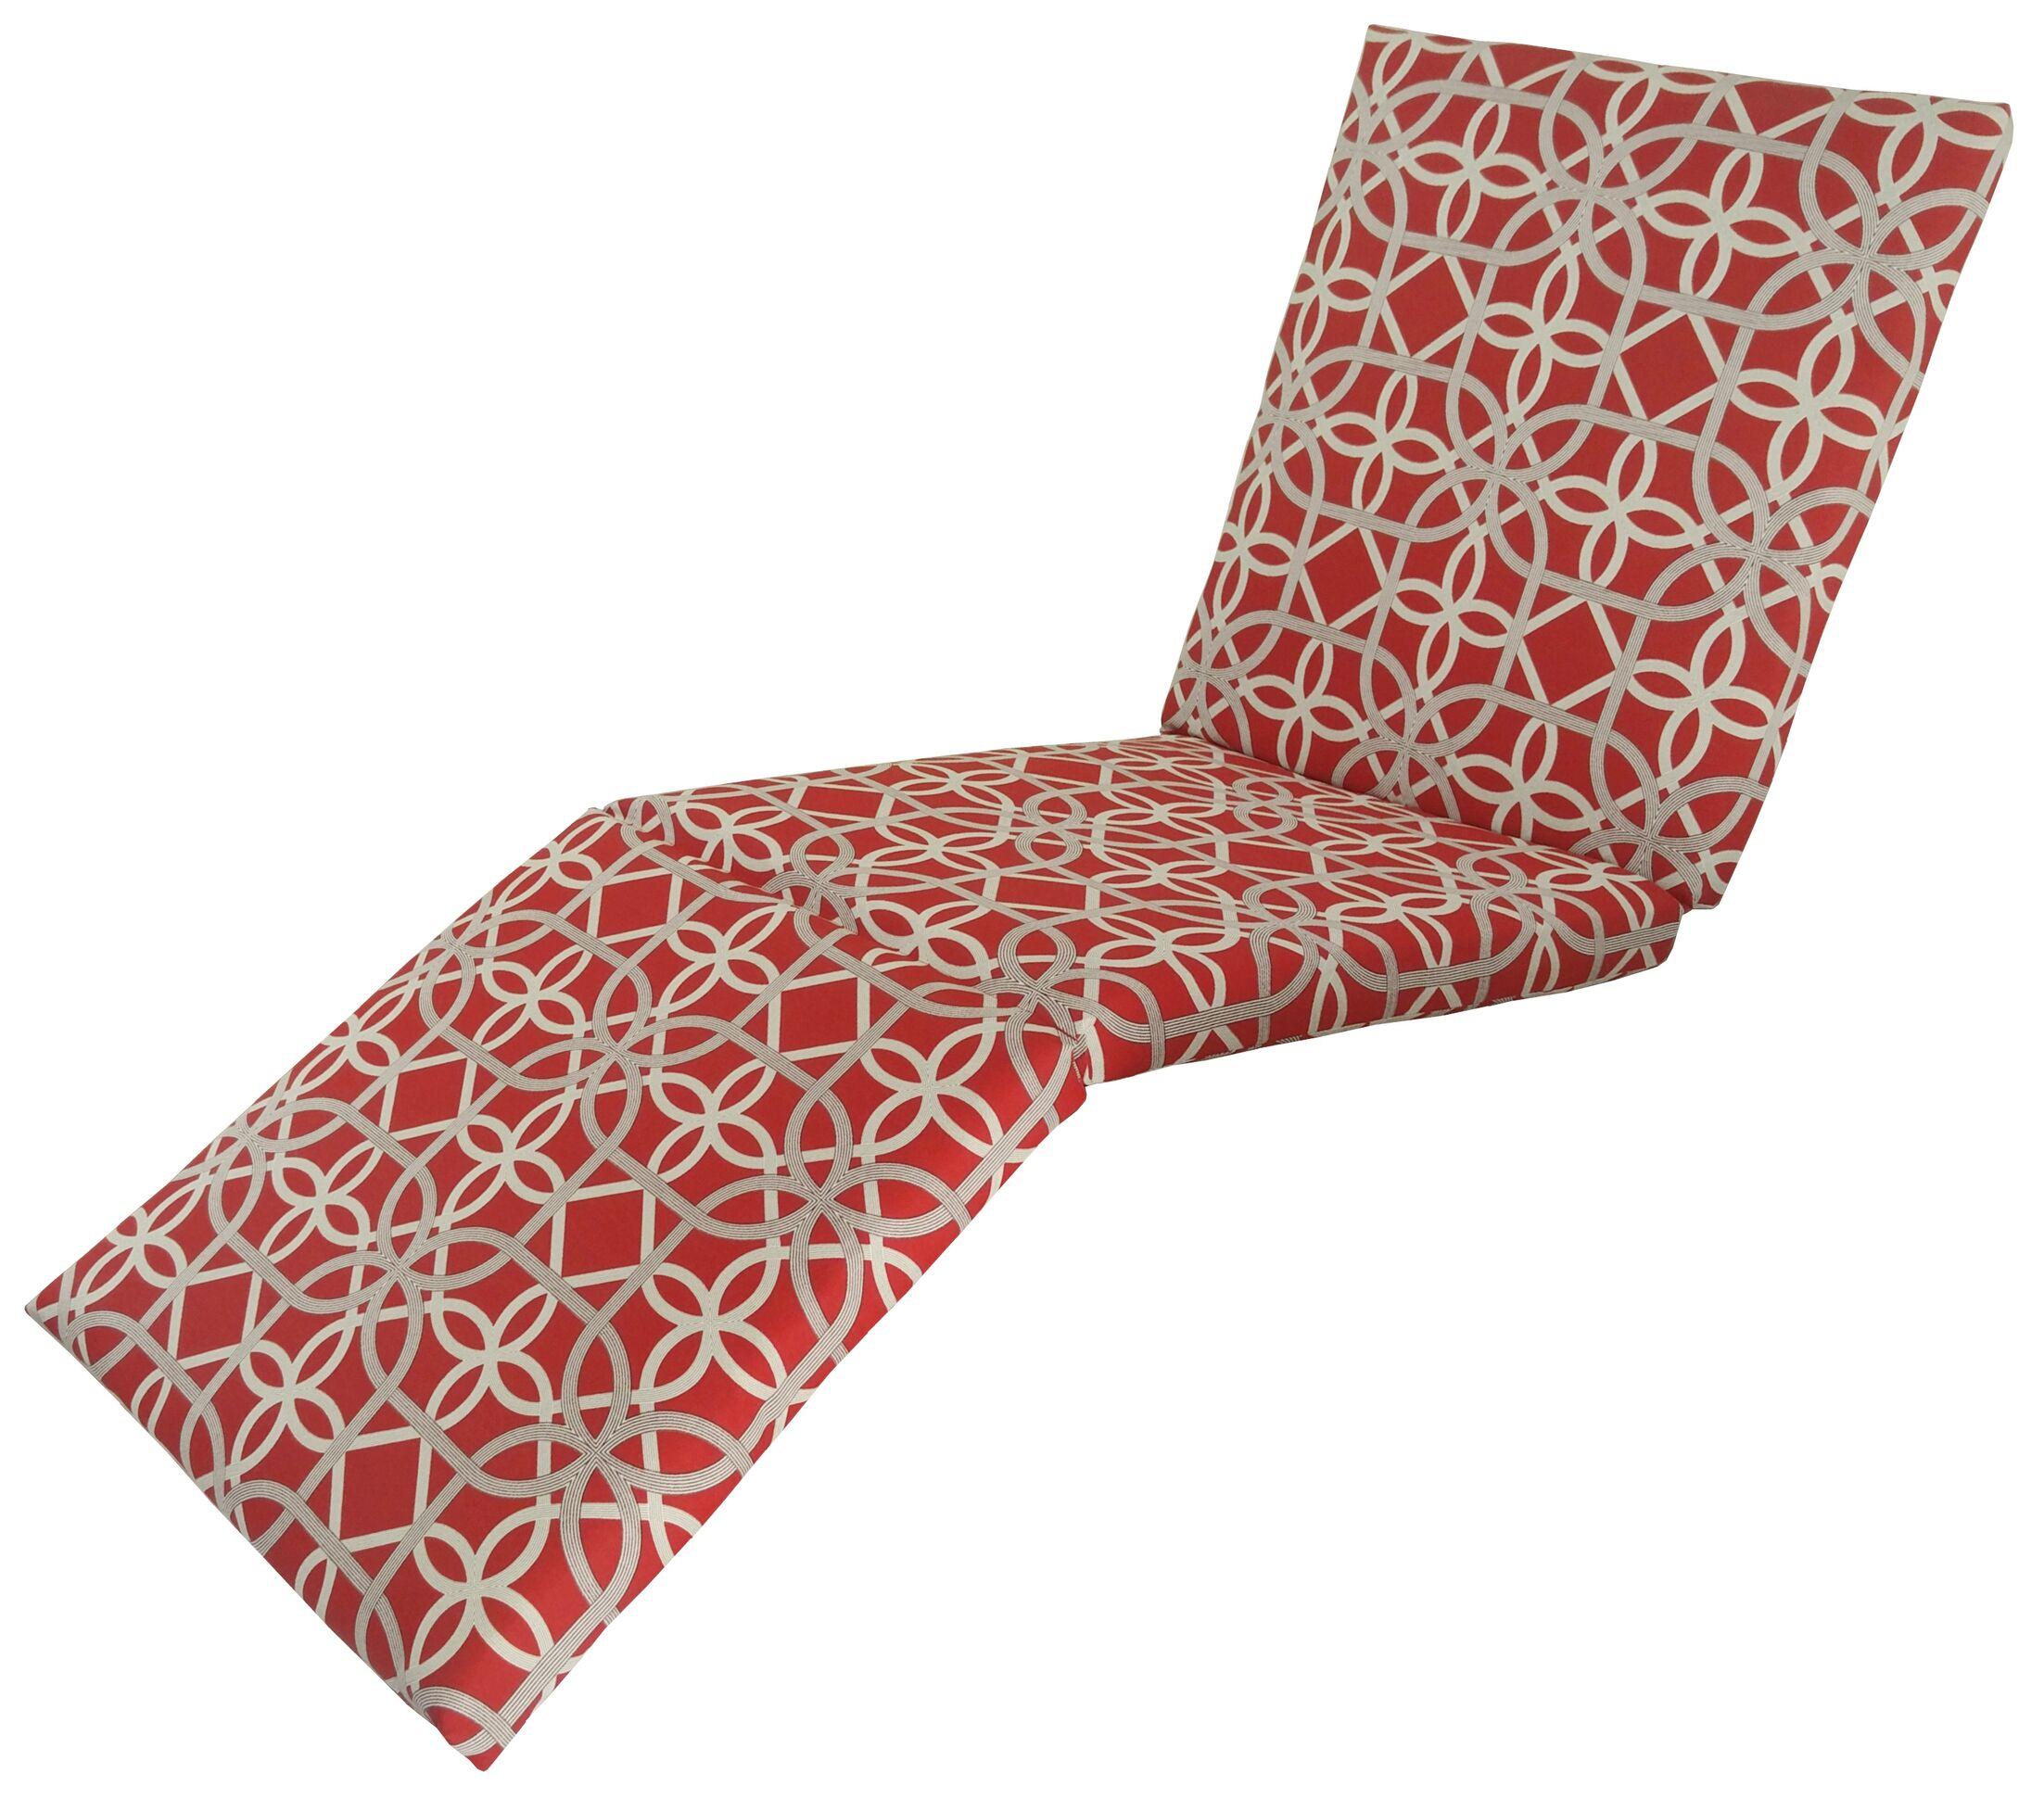 Marissa Indoor/Outdoor Chaise Lounge Cushion Fabric: Cherry